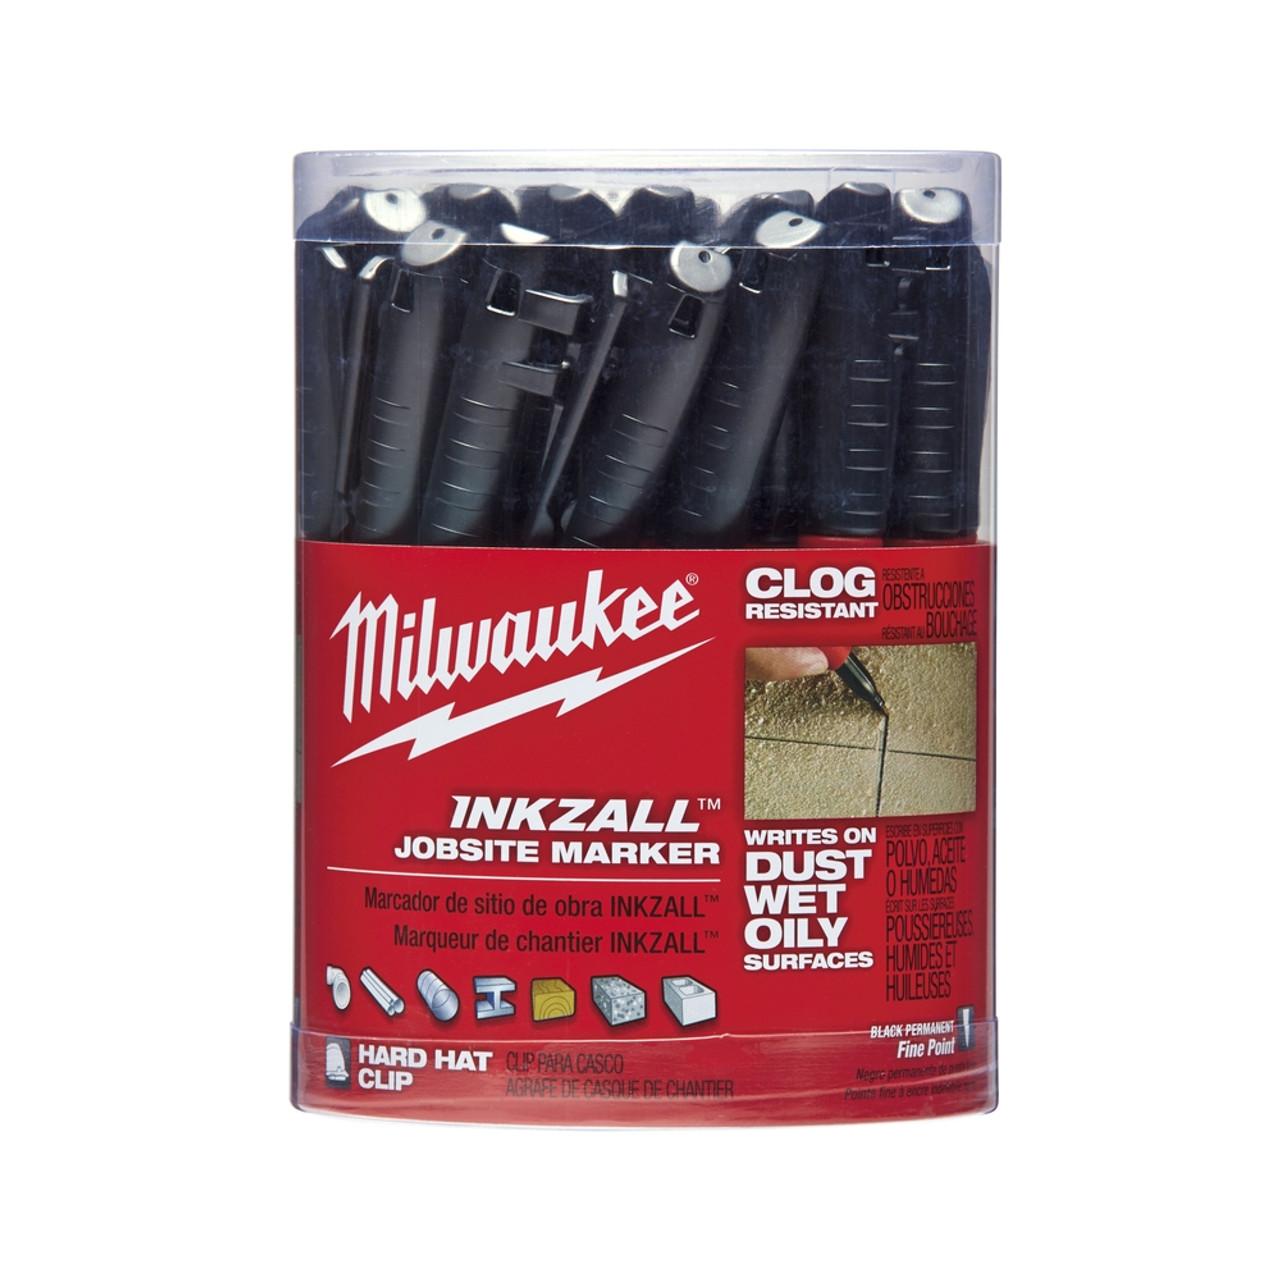 Milwaukee 48-22-3100 INKZALL Black Fine Point Marker 36 pk